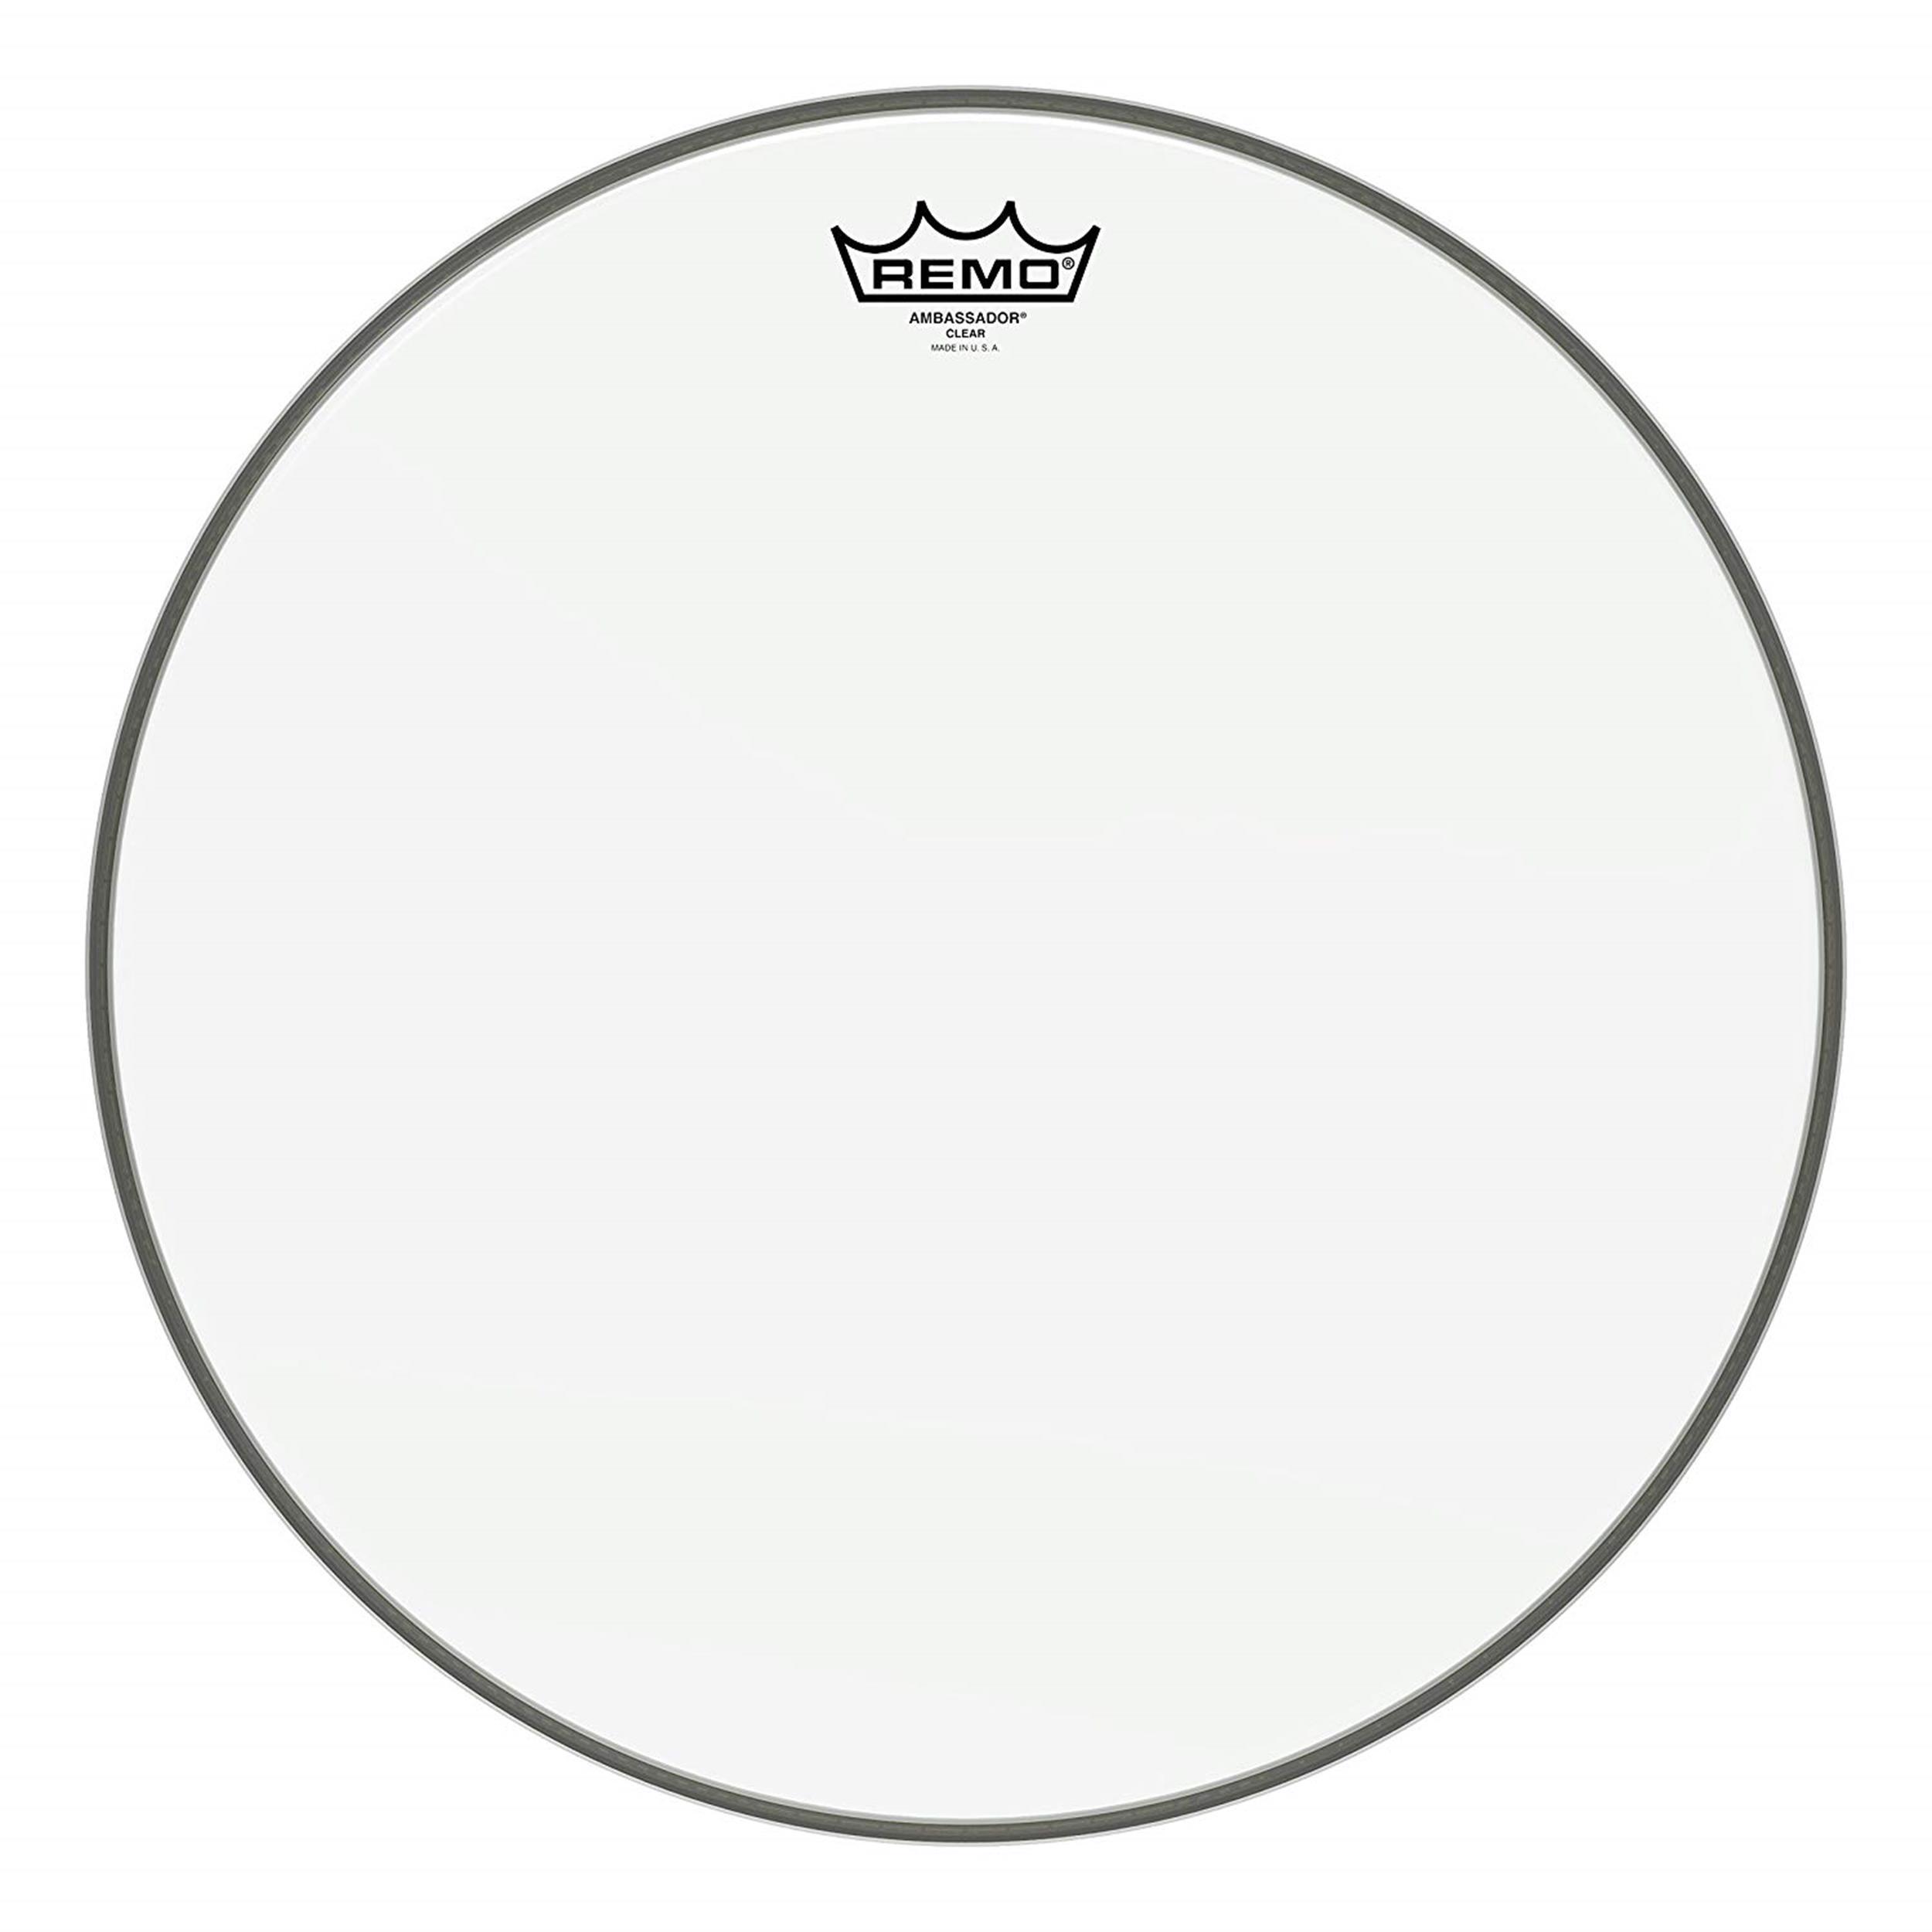 REMO-AMBASSADOR-CLEAR-16-sku-6926